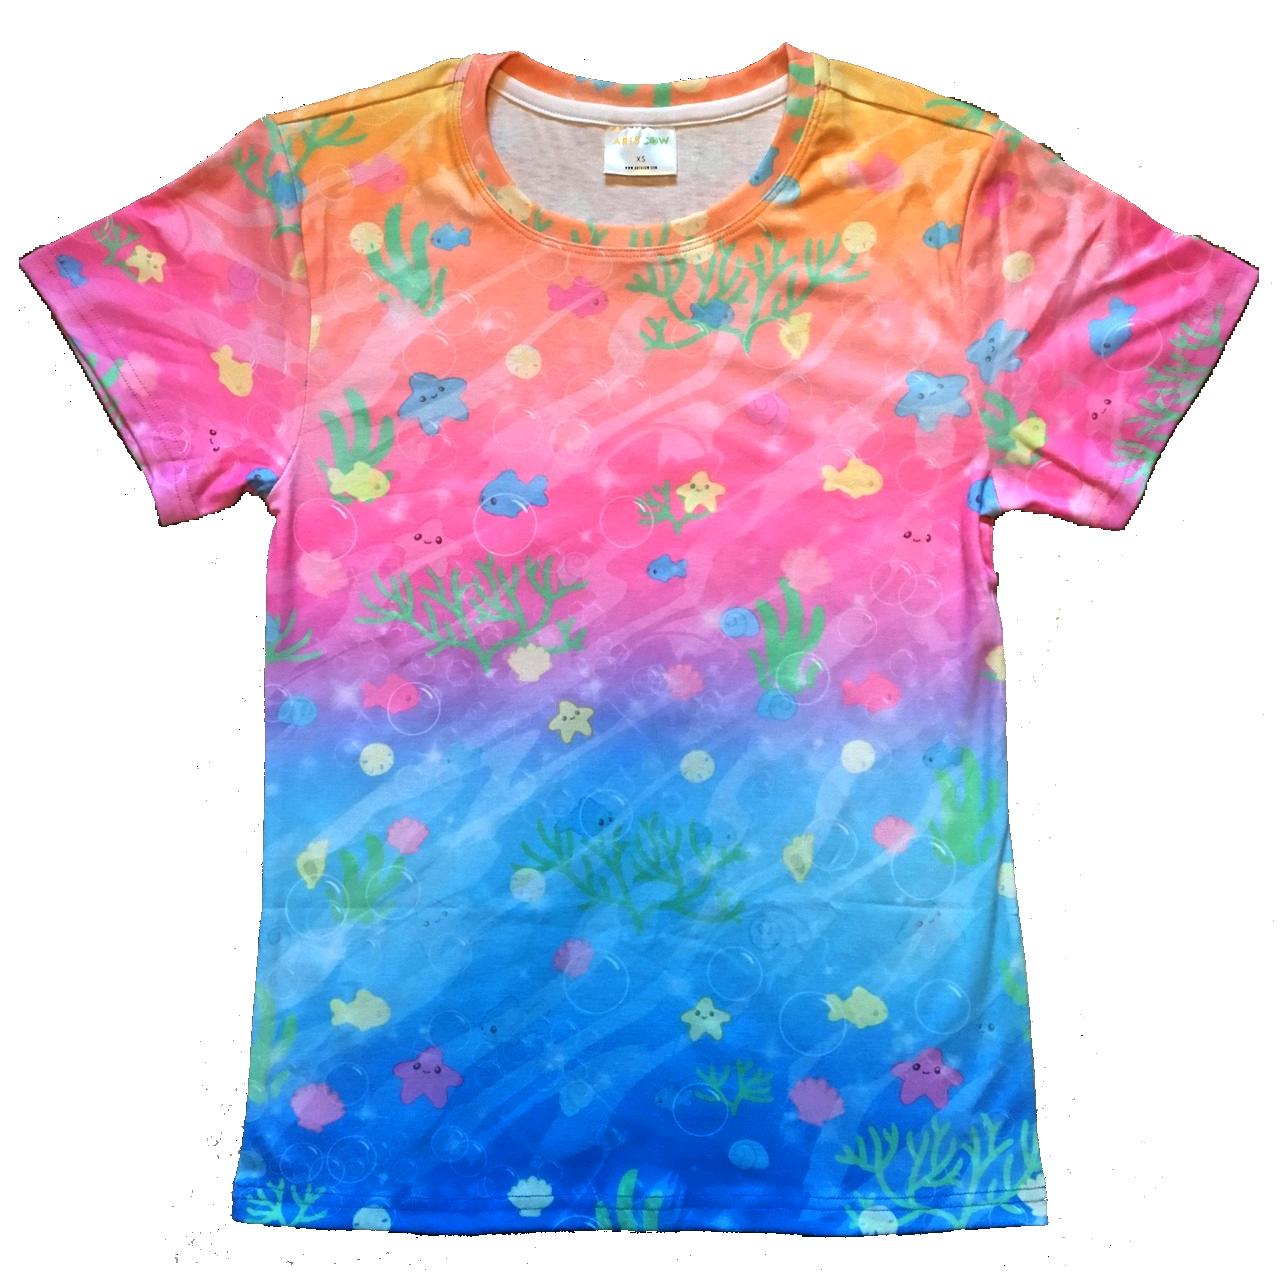 merbabe shirt front trans bg.png